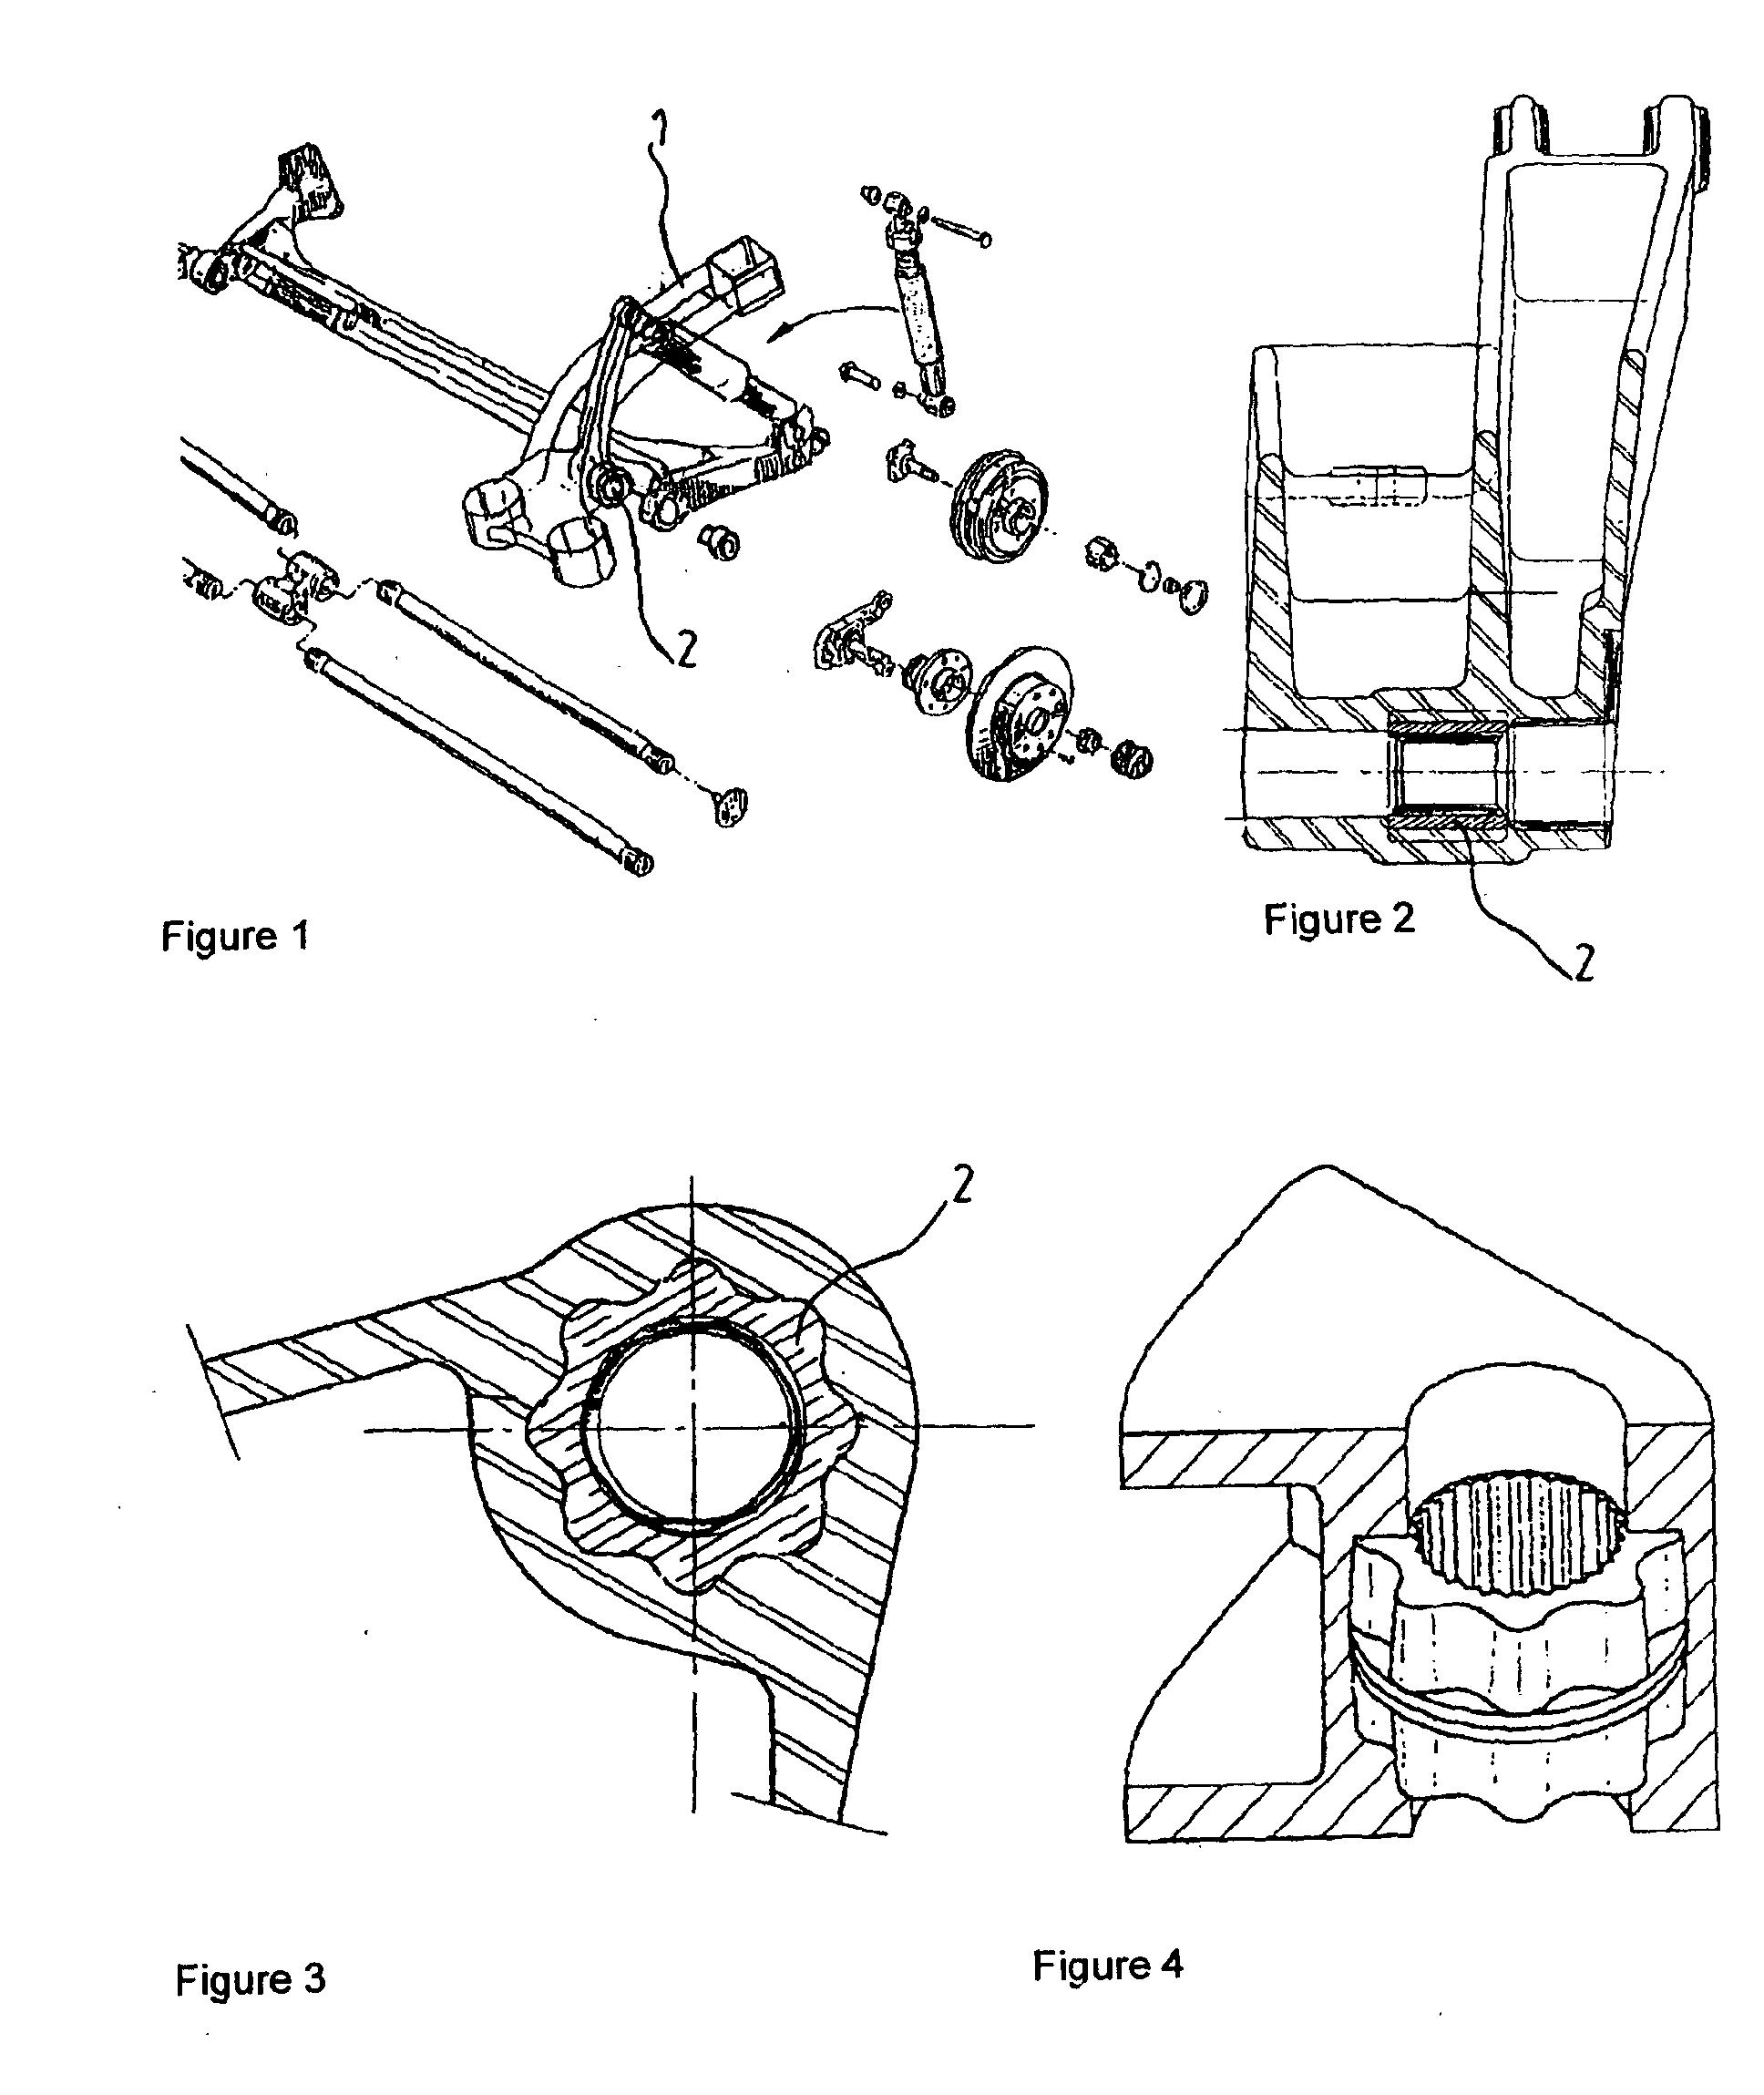 brevet ep1118457a1 pi ce bim tallique en alliage d. Black Bedroom Furniture Sets. Home Design Ideas